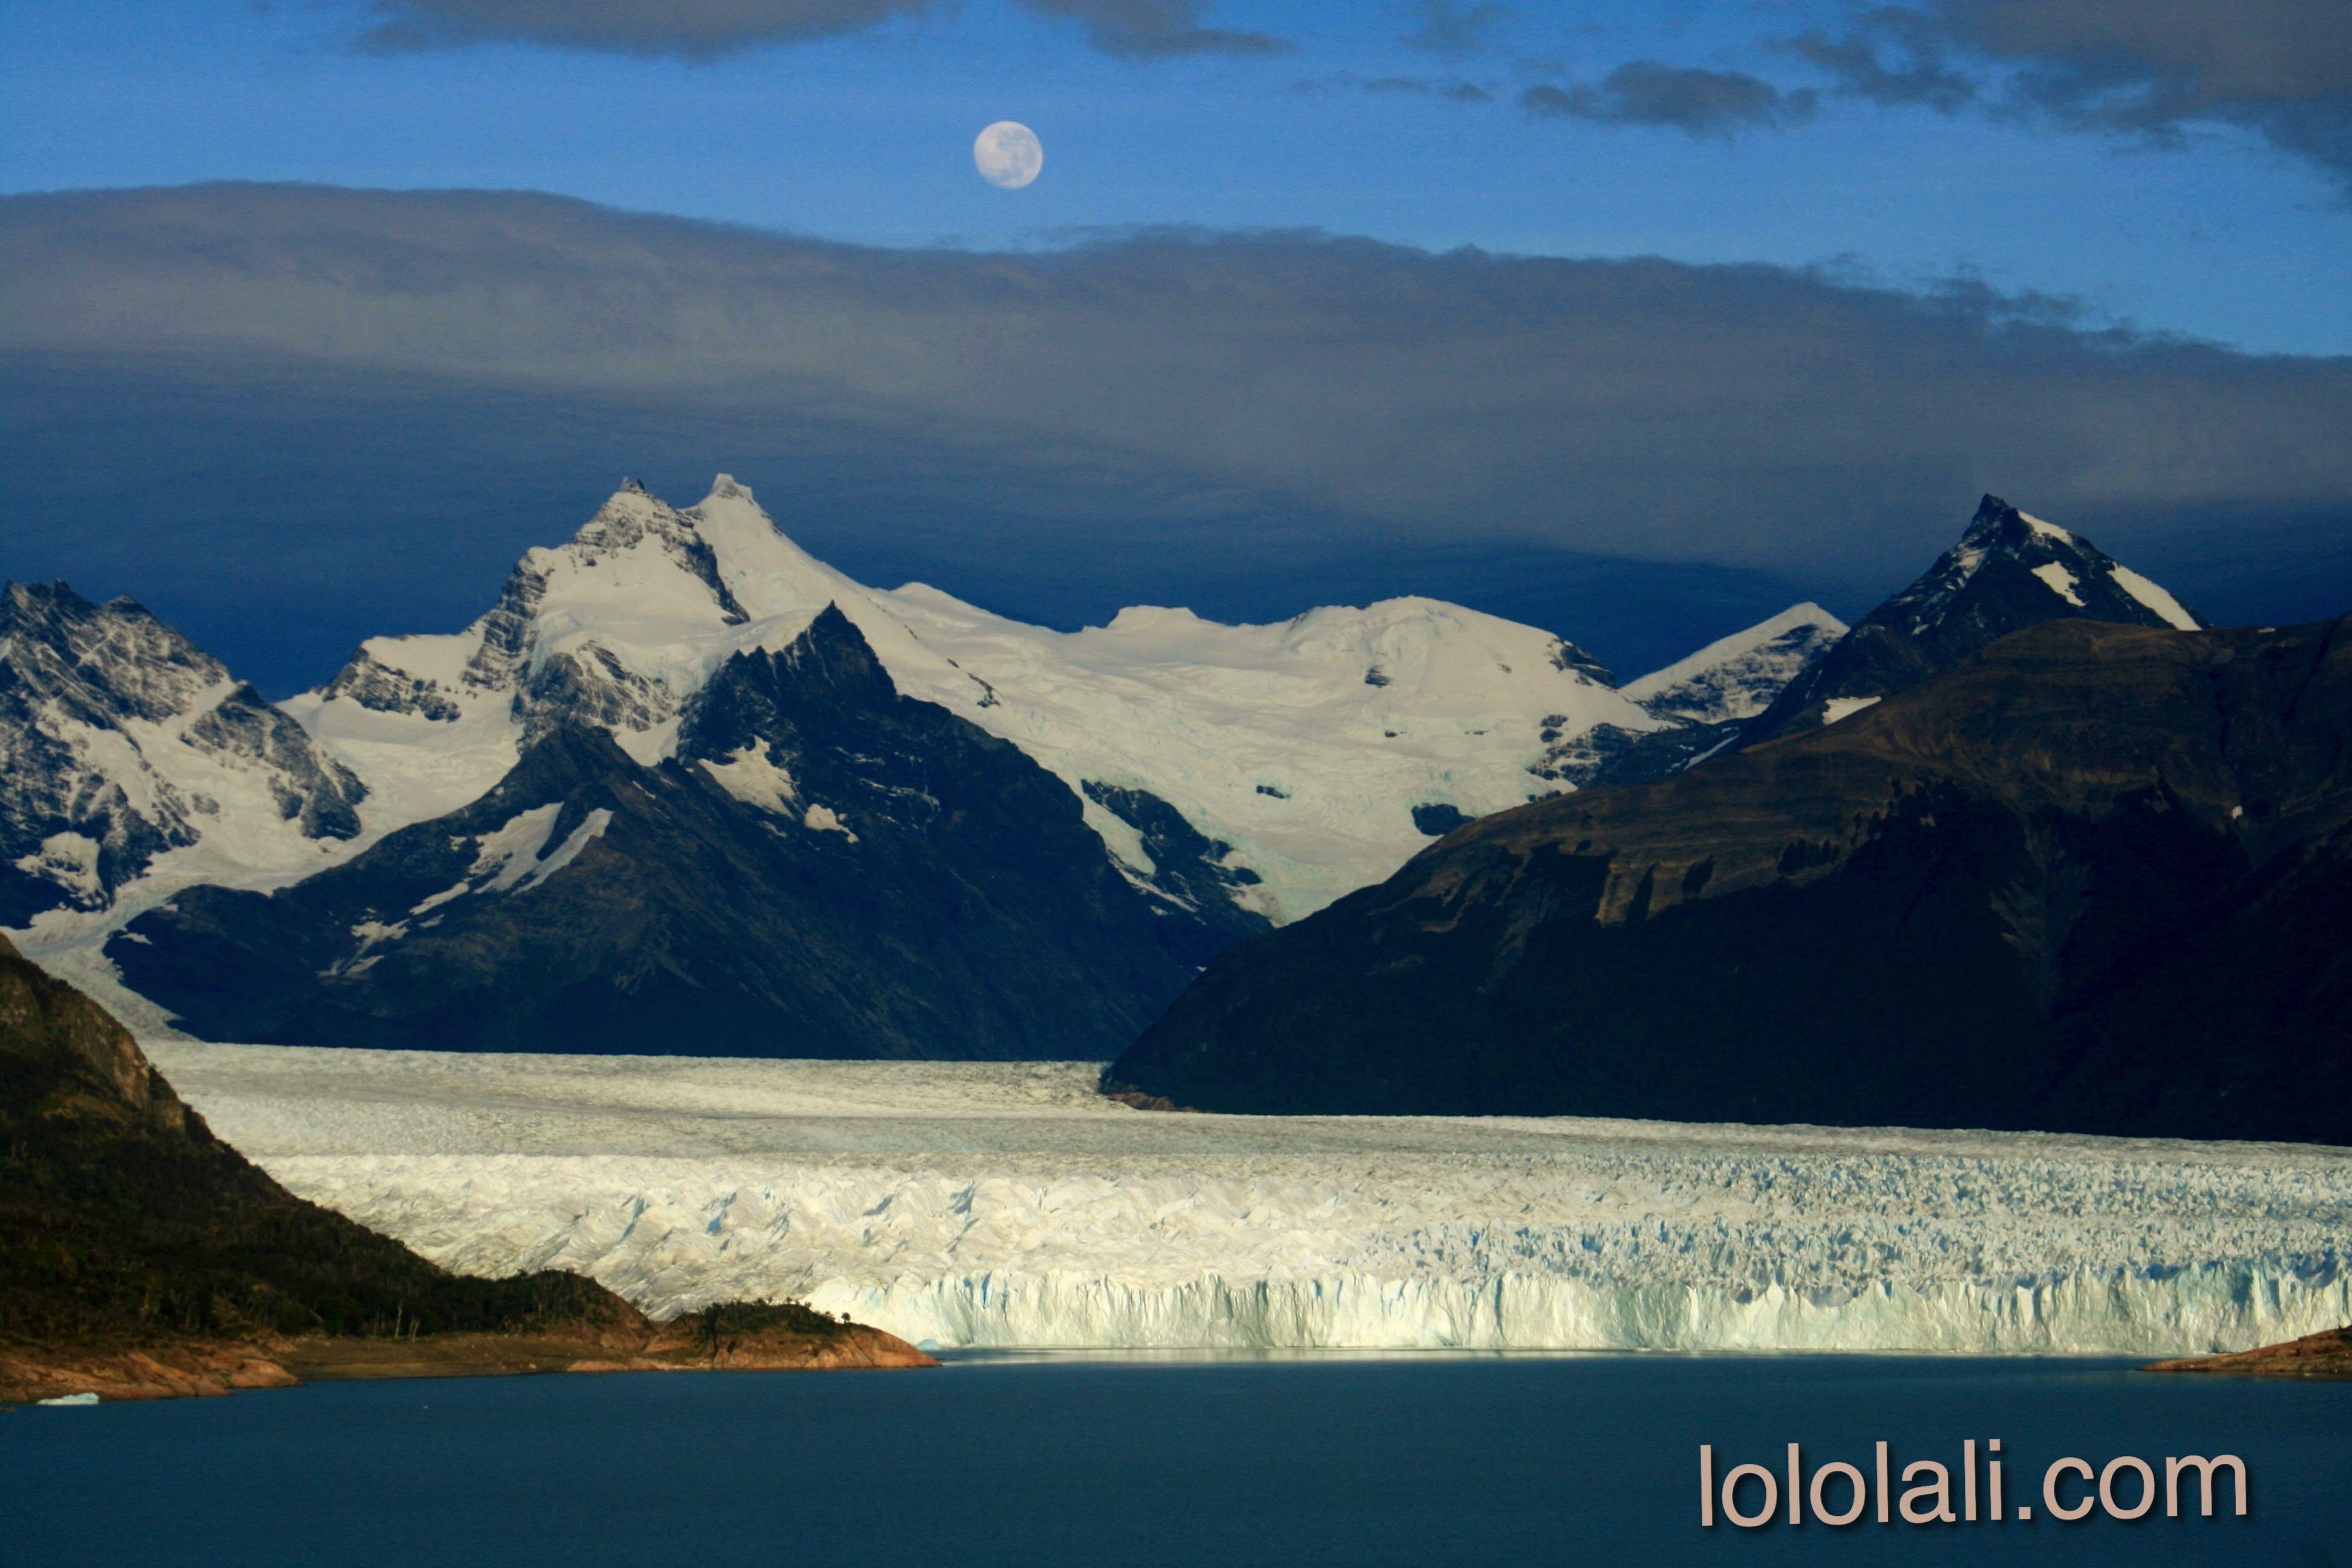 Vista panorámica del Glaciar Perito Moreno